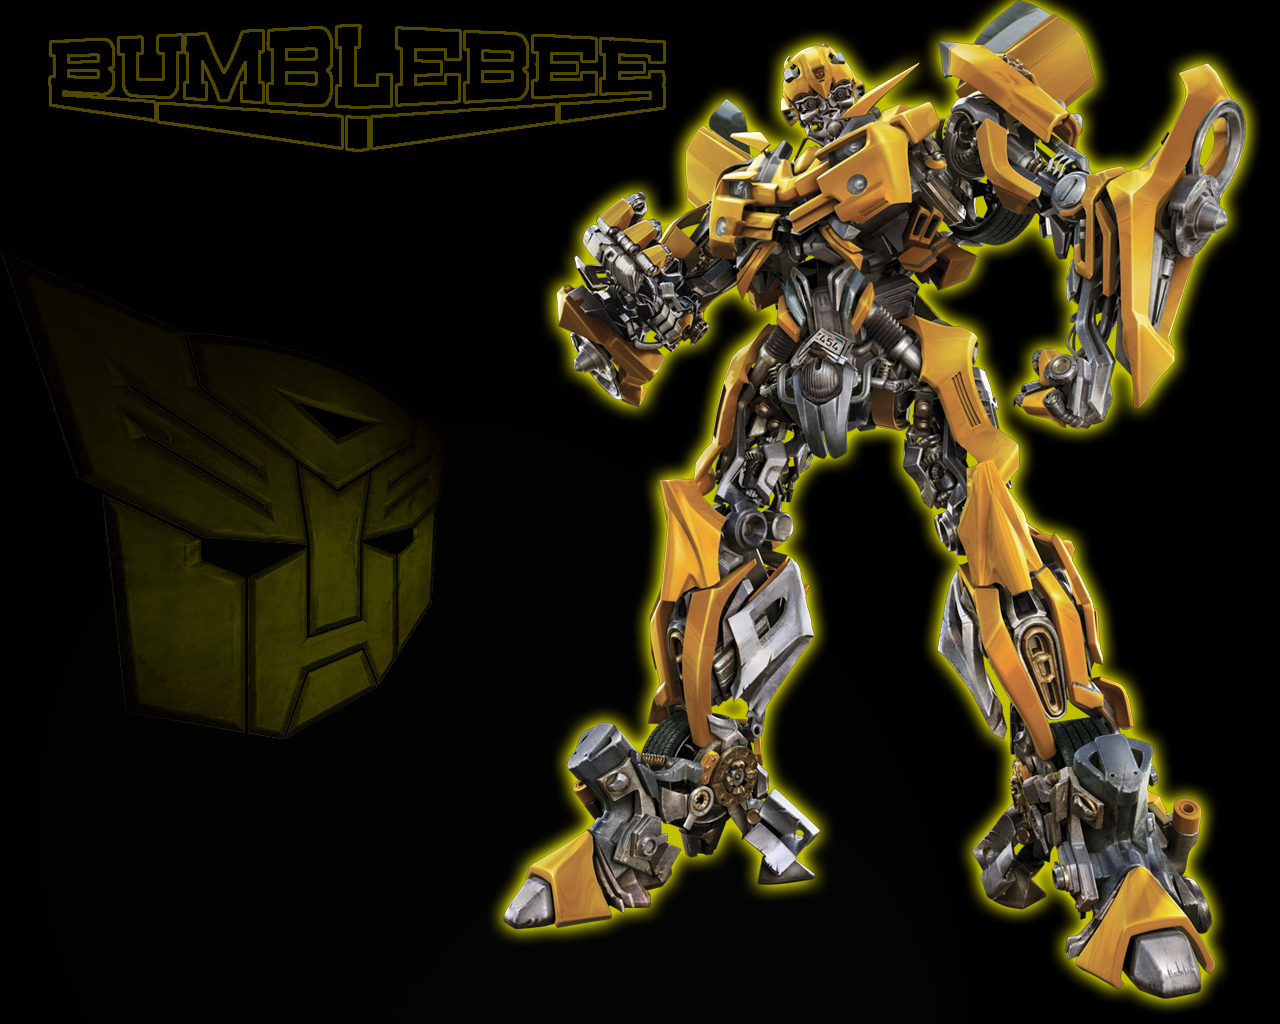 http://images.fanpop.com/images/image_uploads/Transformers-transformers-627084_1280_1024.jpg